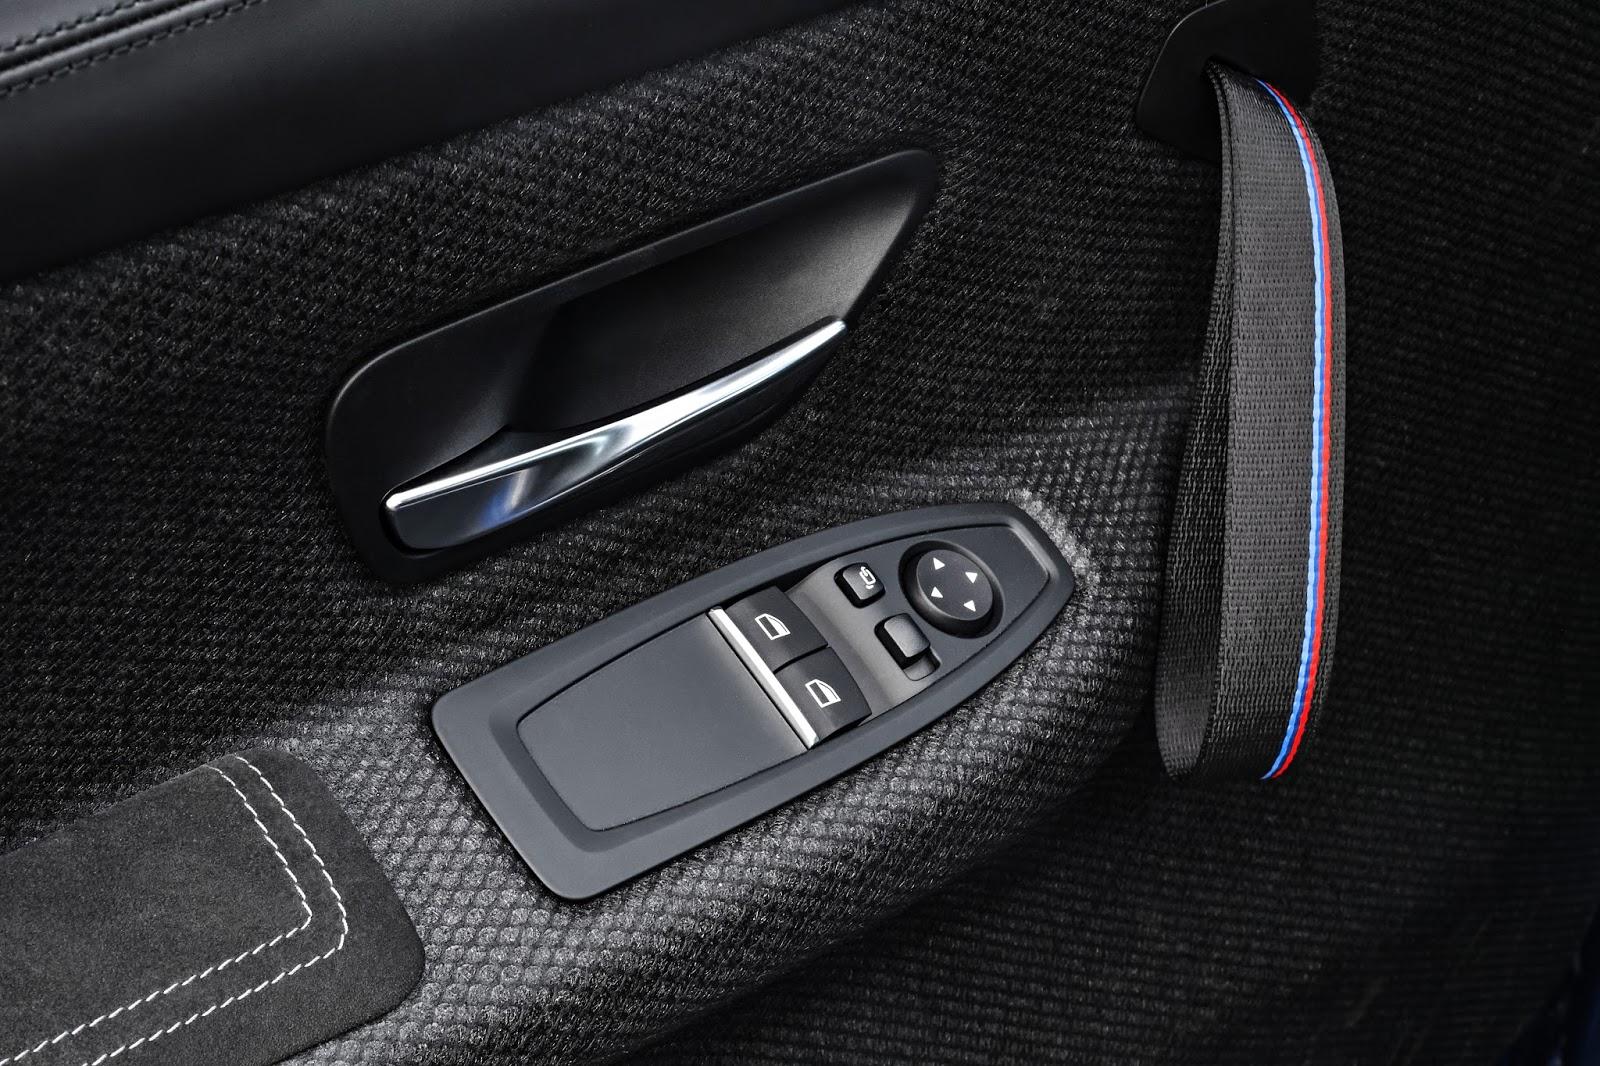 P90251062 highRes the new bmw m4 cs 04 Η περιορισμένης παραγωγής BMW M4 ClubSport δική σας με 116.900 ευρώ BMW, BMW M, BMW M4, BMW M4 CS, BMW Motorsport, clubsport, COUPE, Limited edition, supercars, supersport, videos, Περιορισμένης παραγωγής